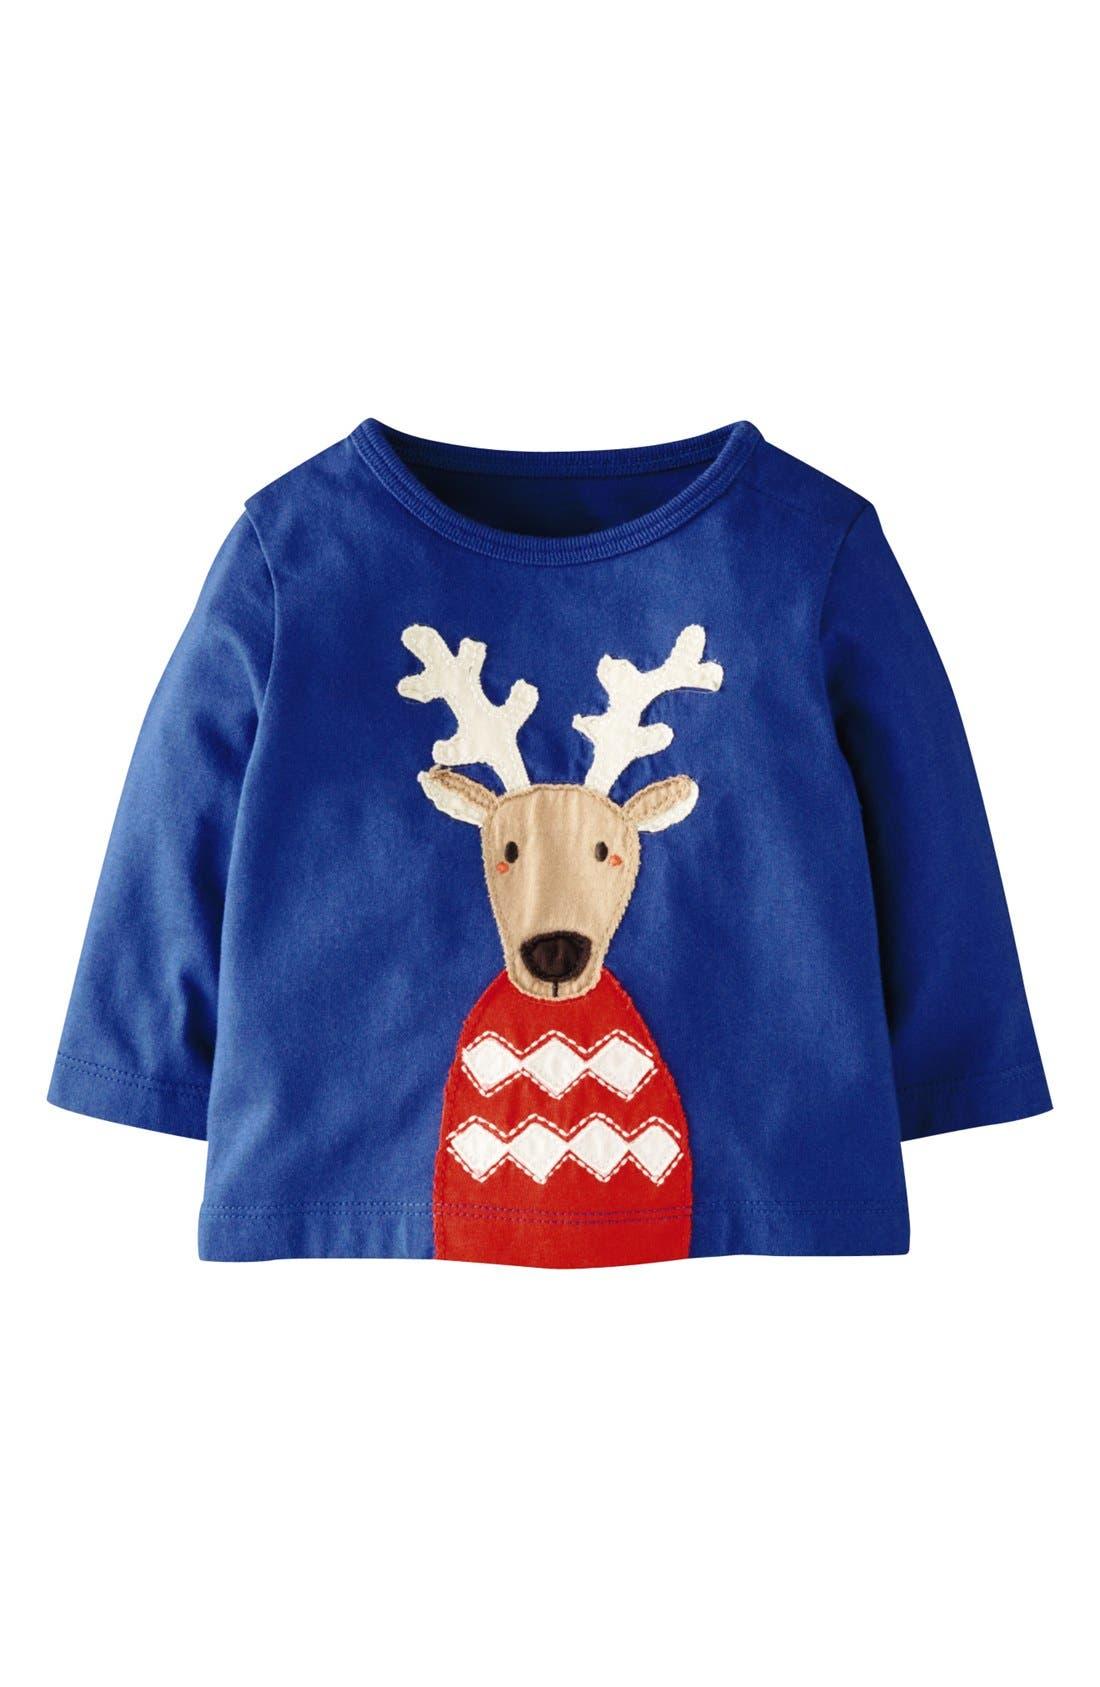 Alternate Image 1 Selected - Mini Boden 'Big Appliqué' T-Shirt (Baby Boys)